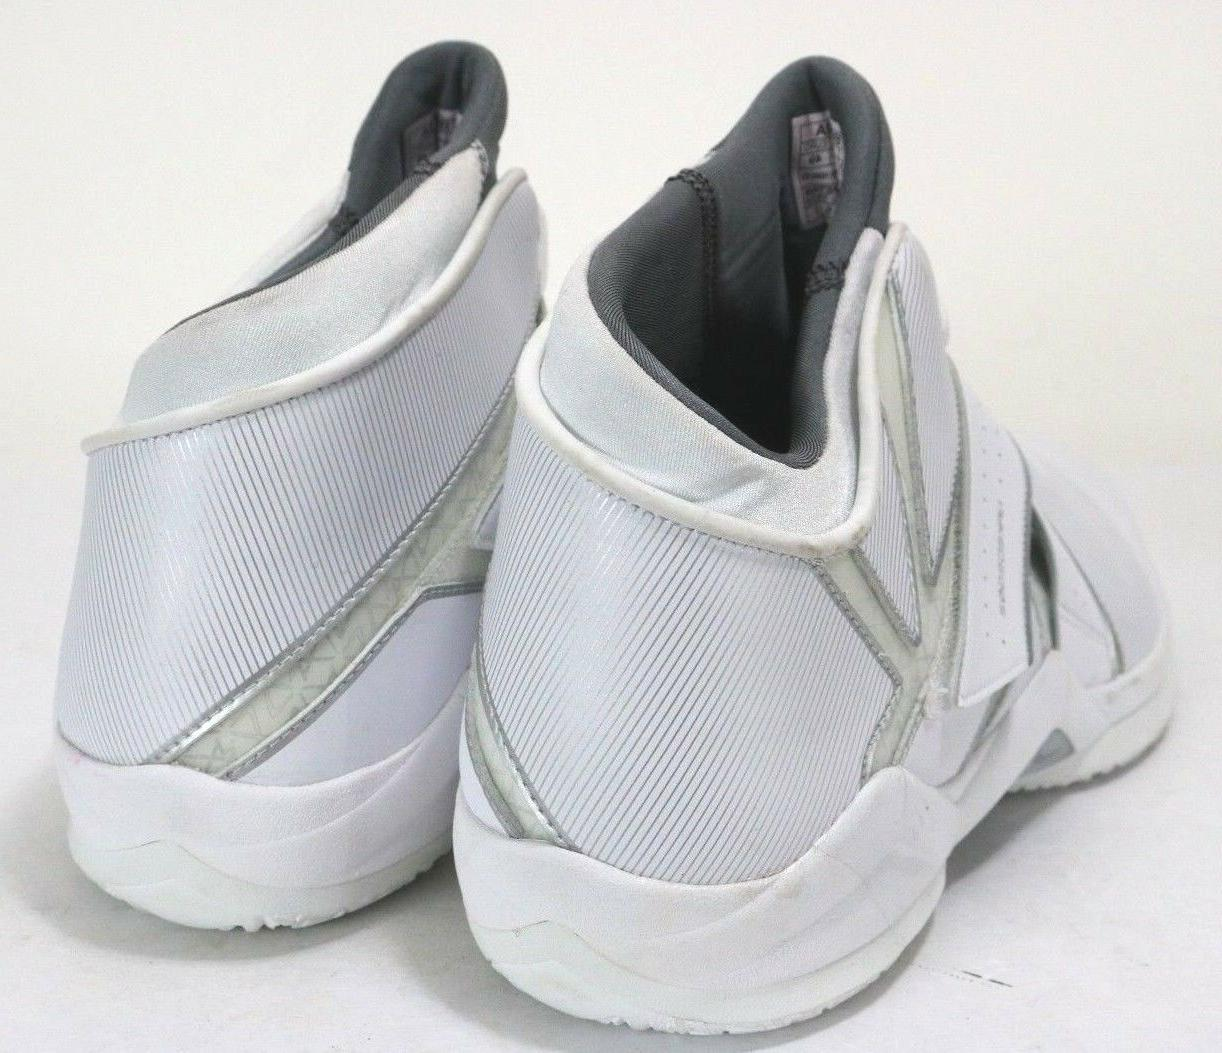 $120 Men's Hi-Top Shoes Size Leather White